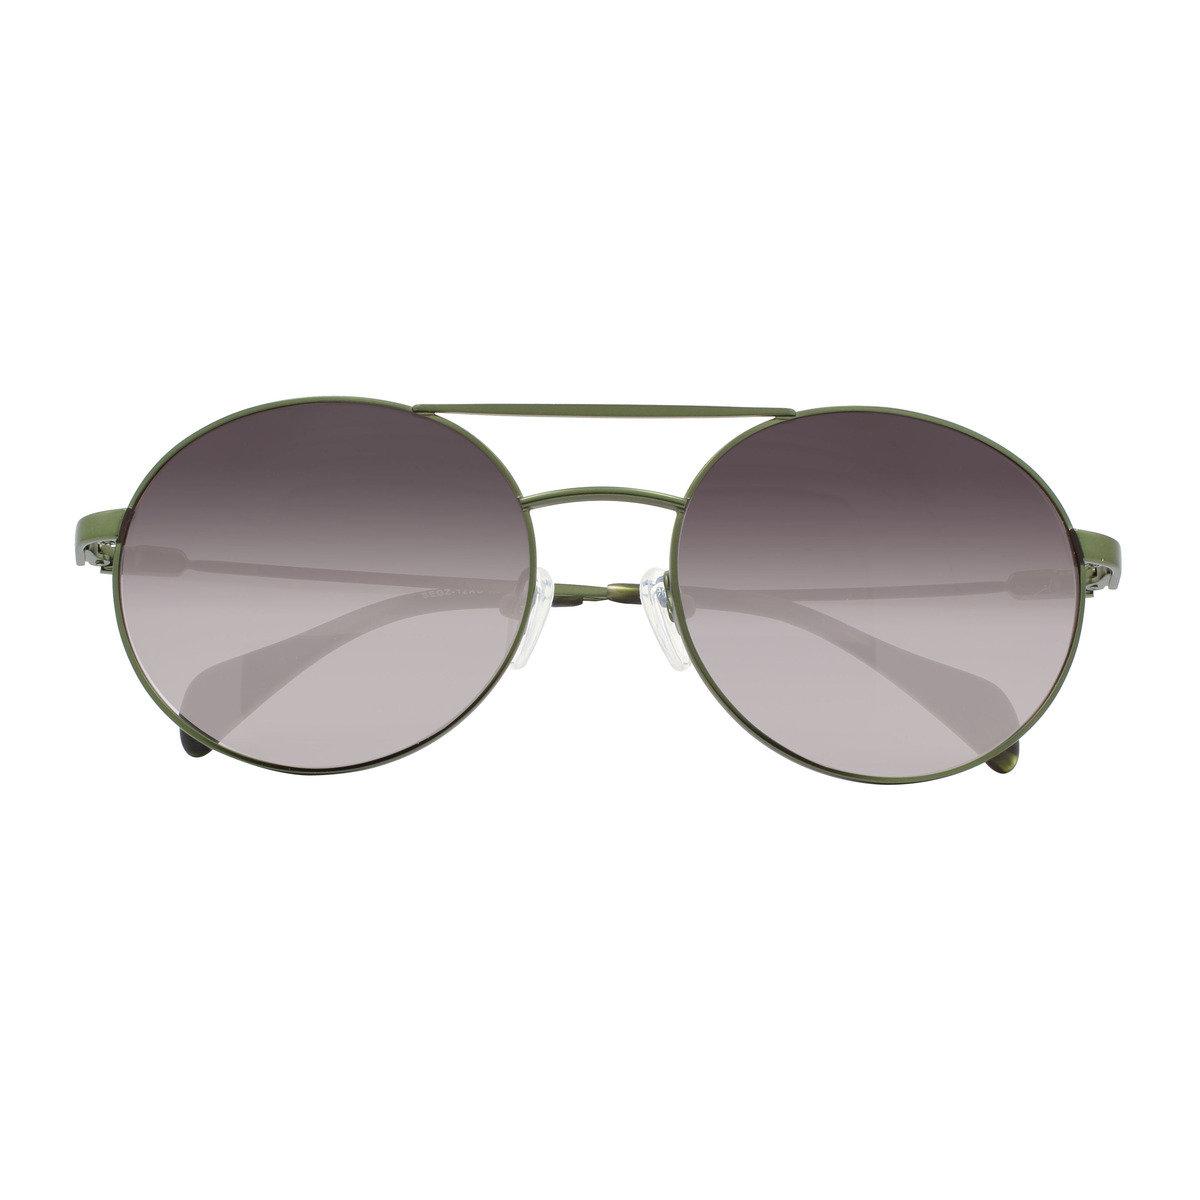 eGG 圓框金屬防UV深綠太陽眼鏡